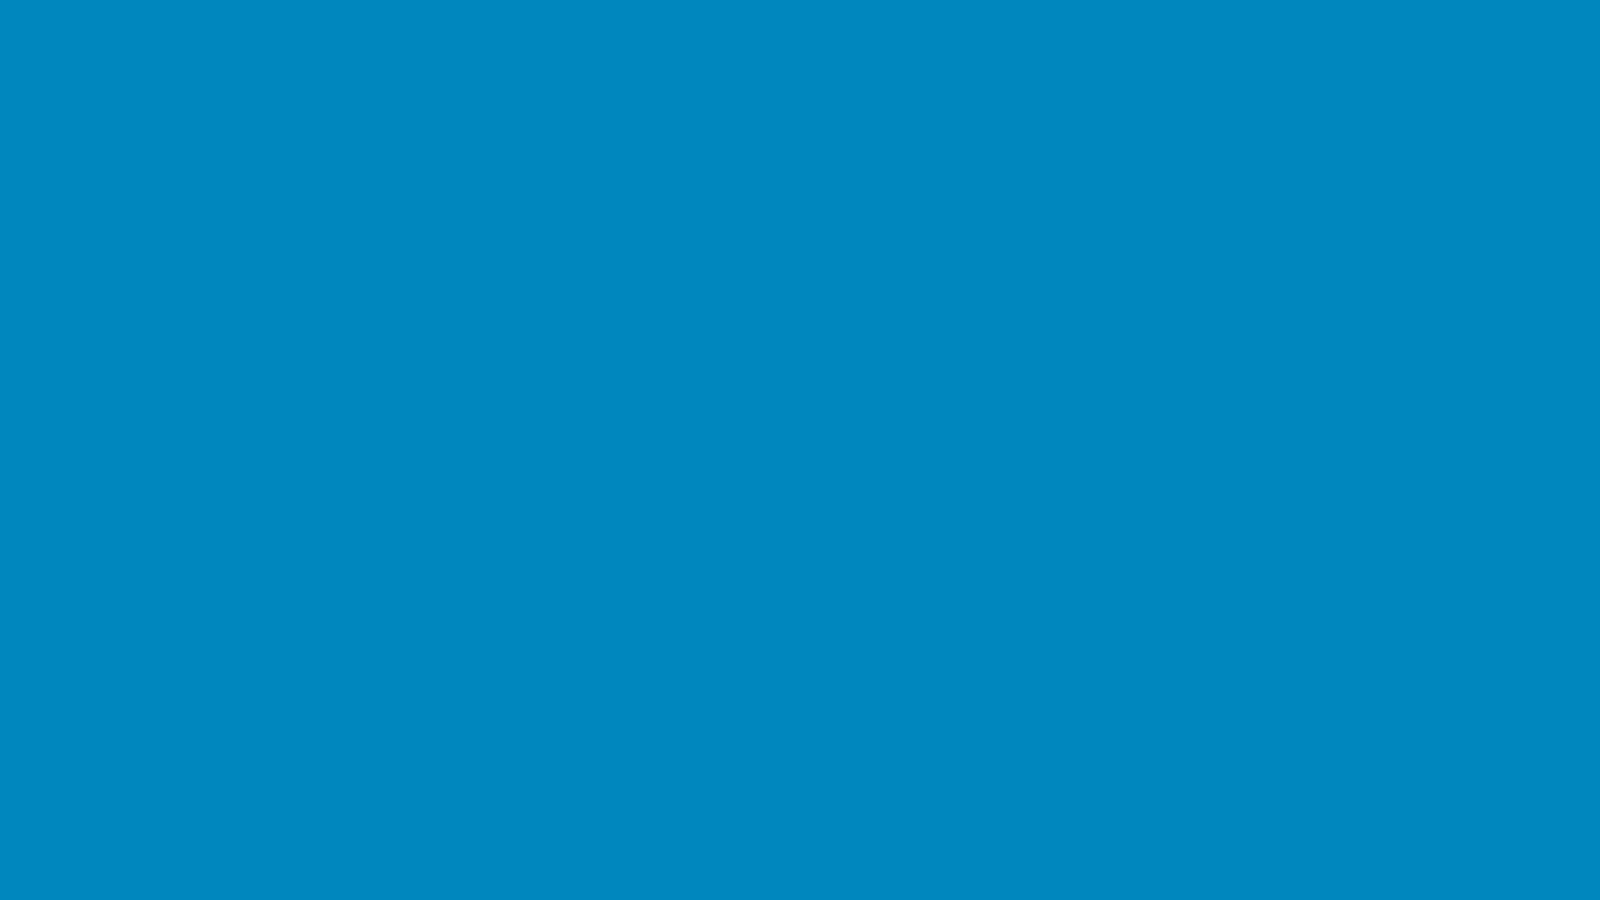 1600x900 Blue NCS Solid Color Background